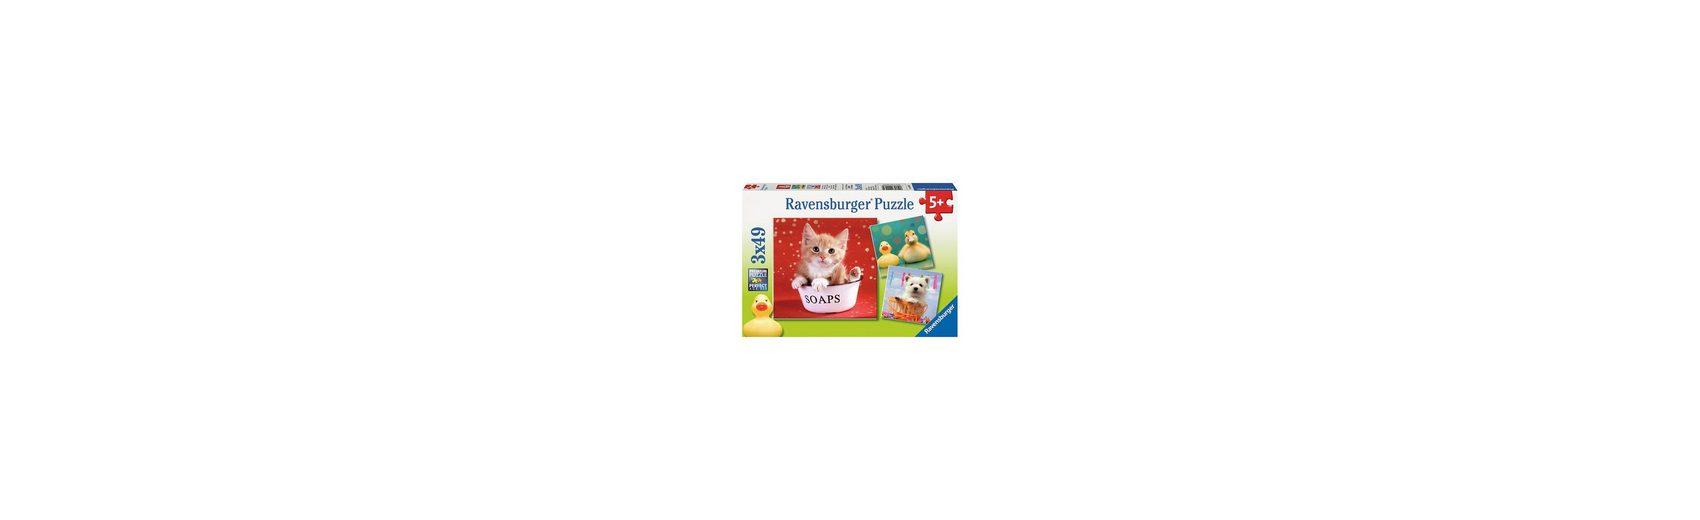 Ravensburger Puzzleset 3 x 49 Teile Lustige Tierwelt